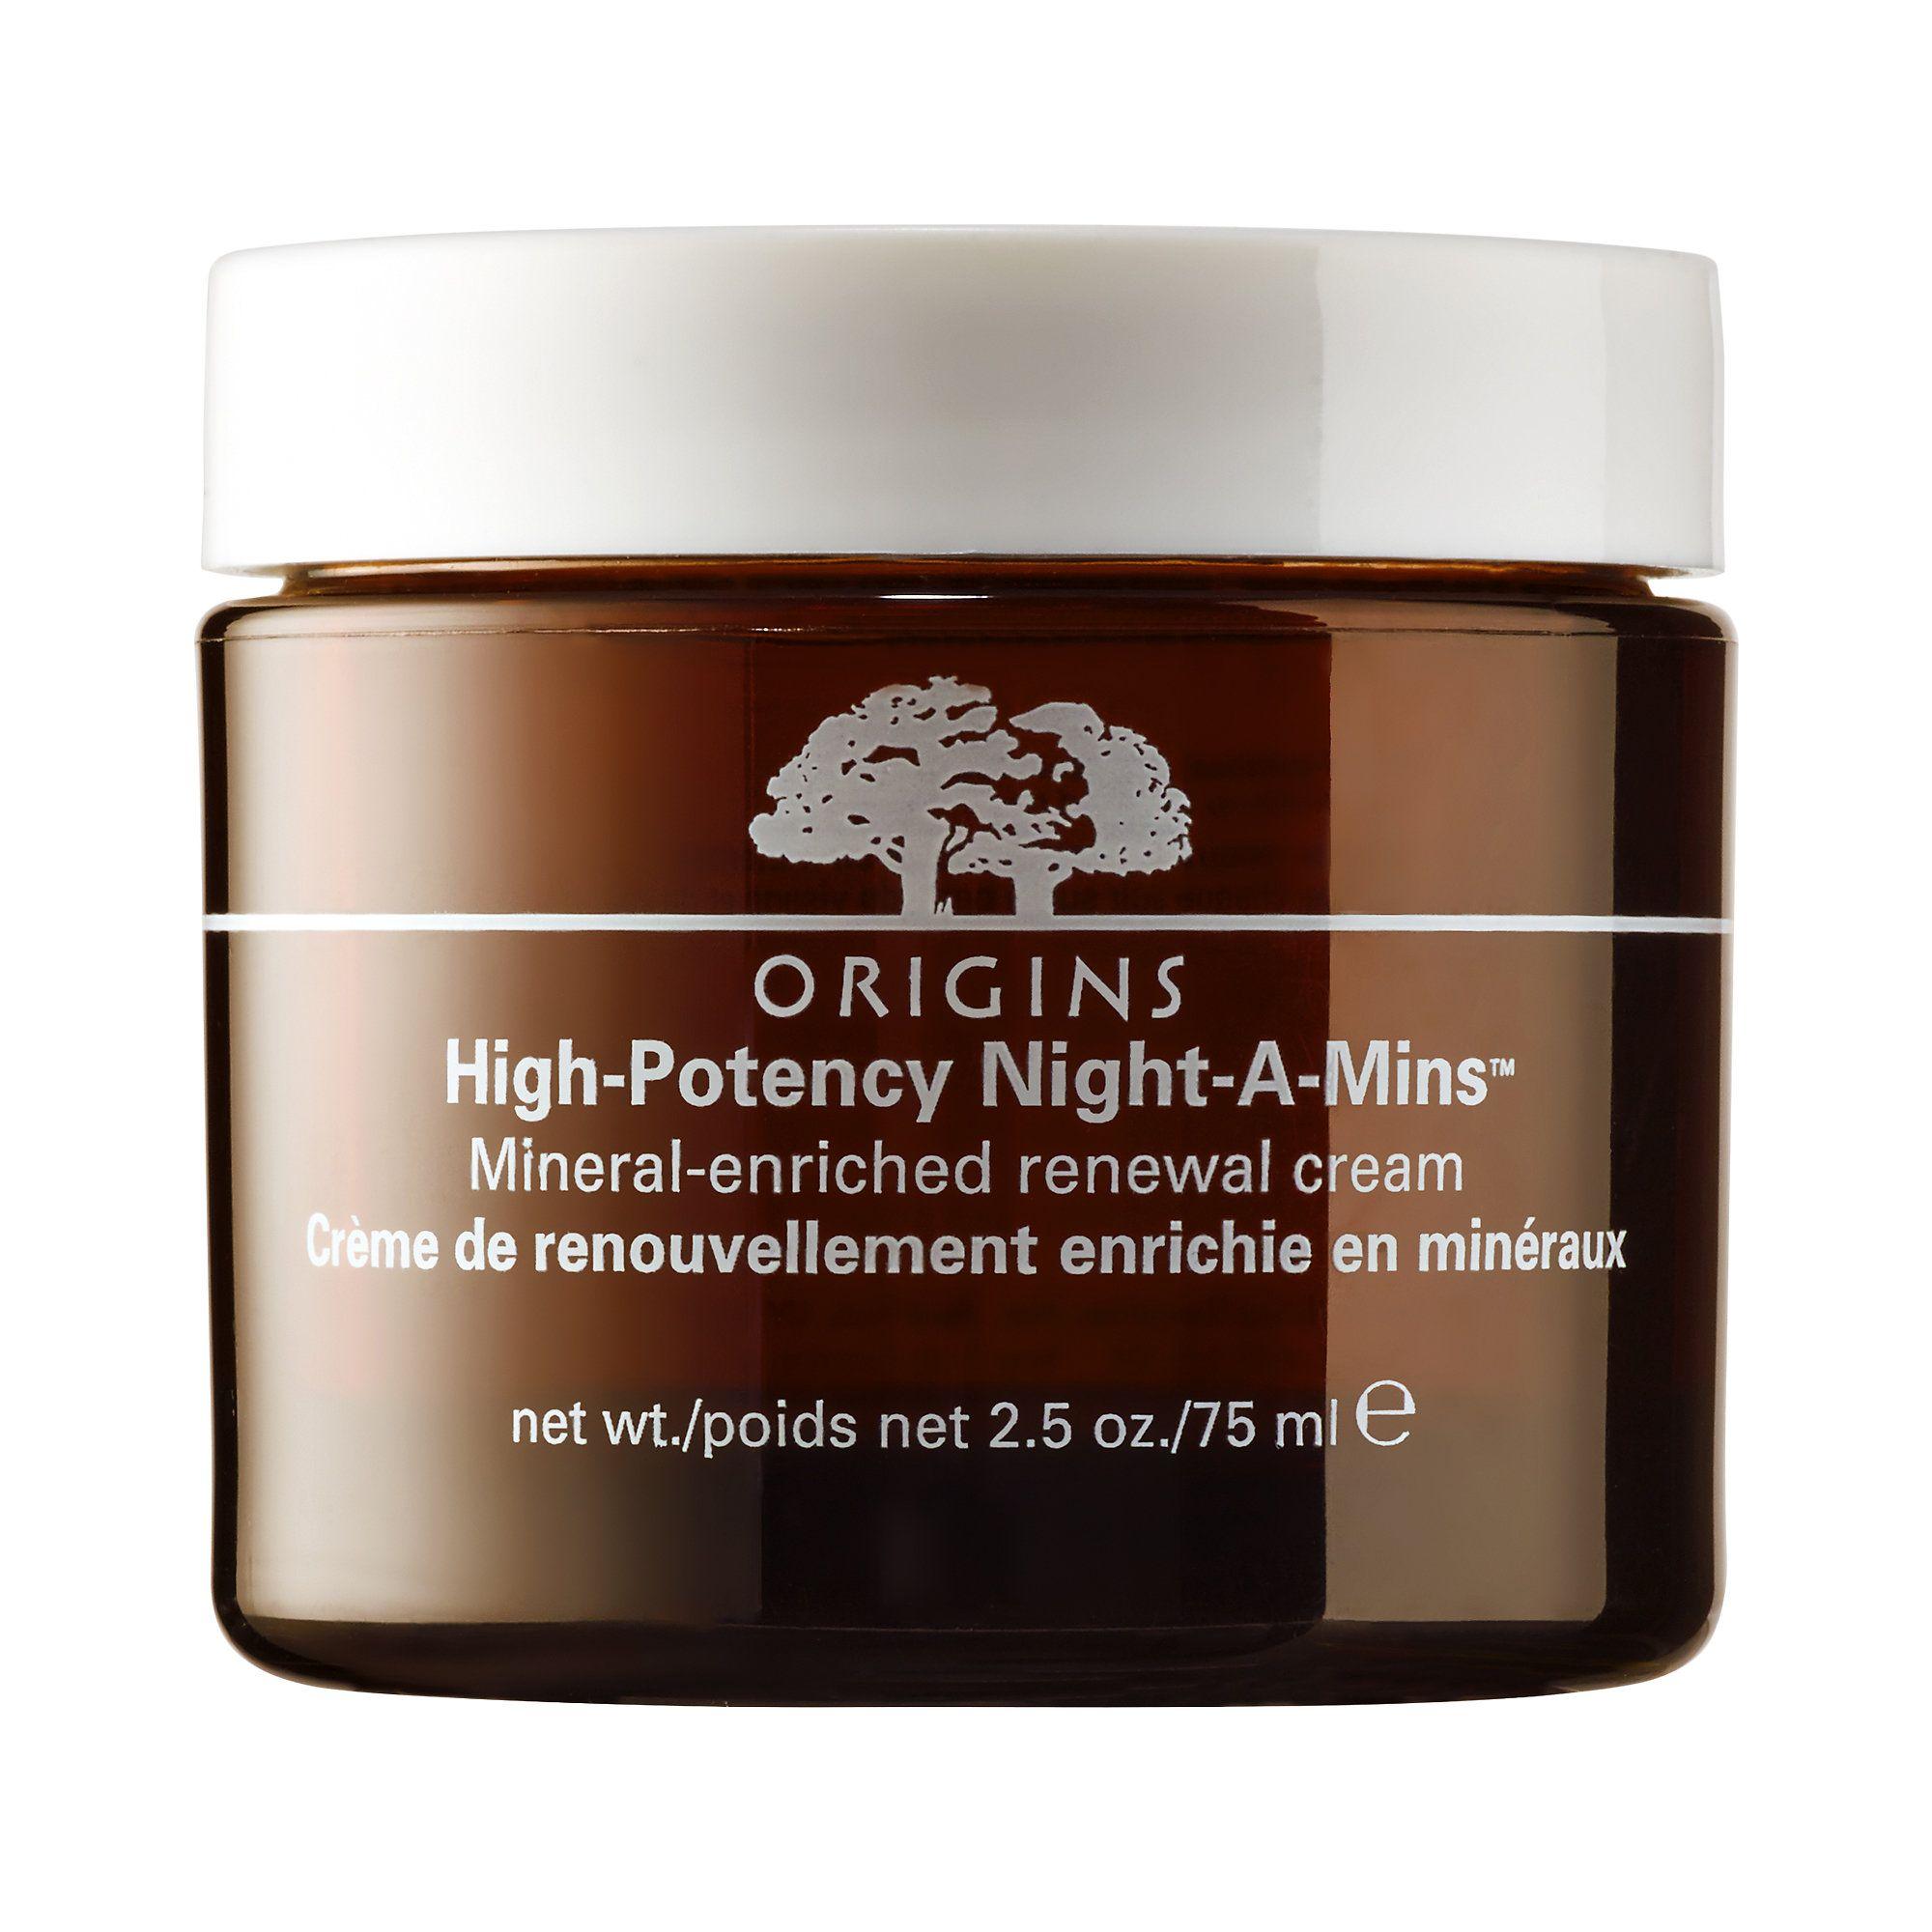 Shop Origins' High Potency Night-A-Mins™ Mineral-Enriched Renewal Cream at Sephora.